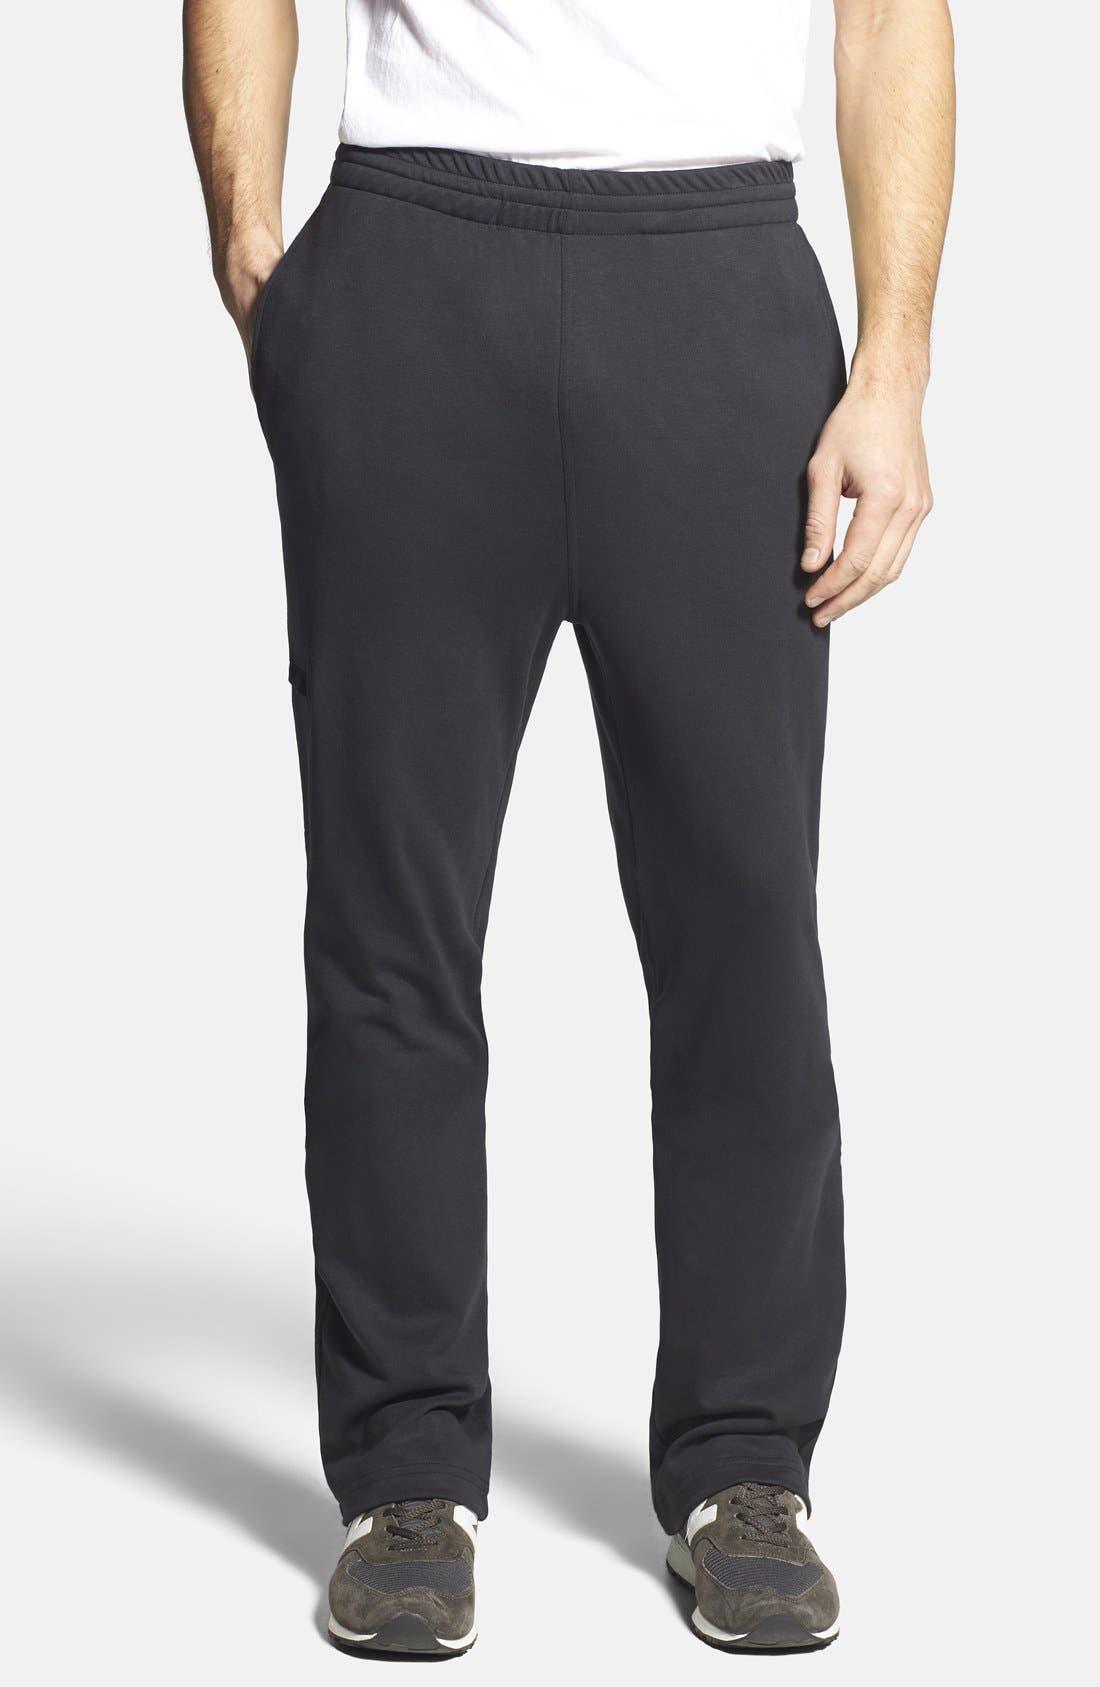 'Leaderboard' Sweatpants,                             Main thumbnail 1, color,                             Black